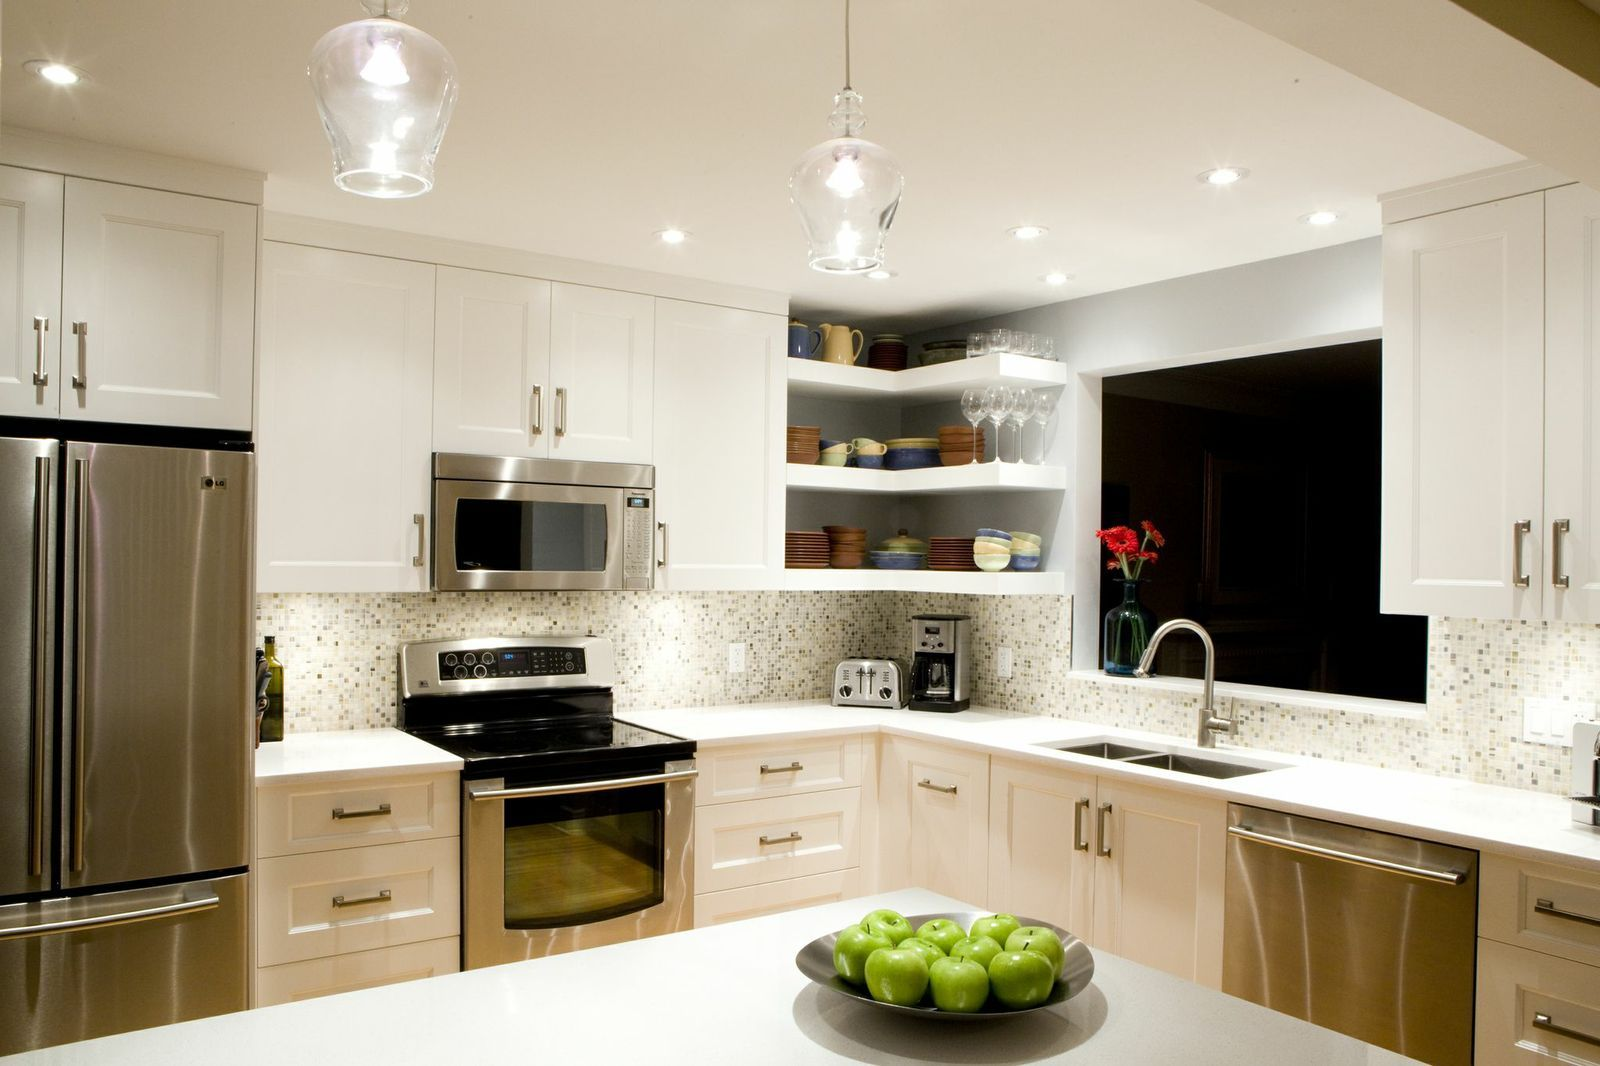 astro design's contemporary kitchen design - #ottawa | kitchens